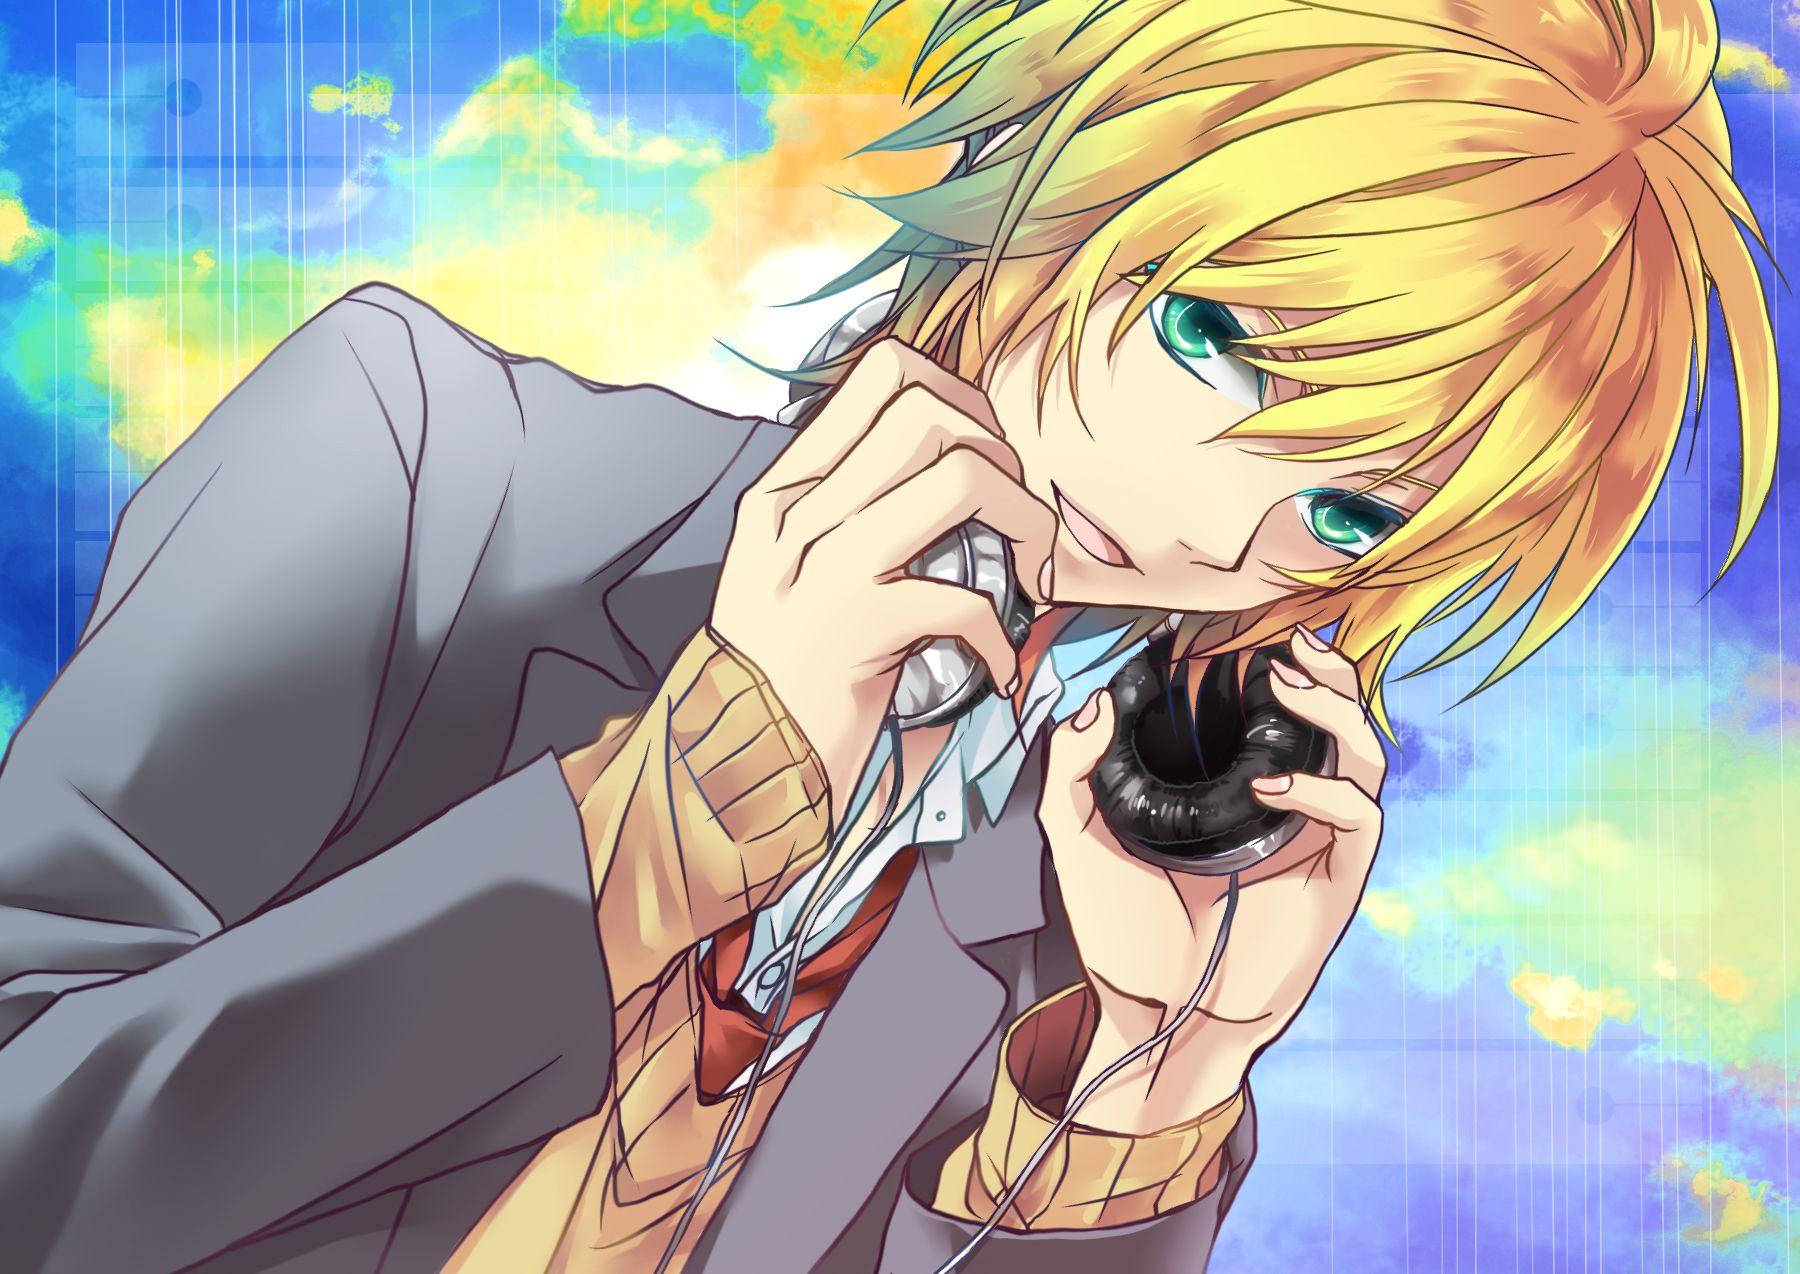 Vocaloid, Kagamine Len Gambar, Anime anak lakilaki